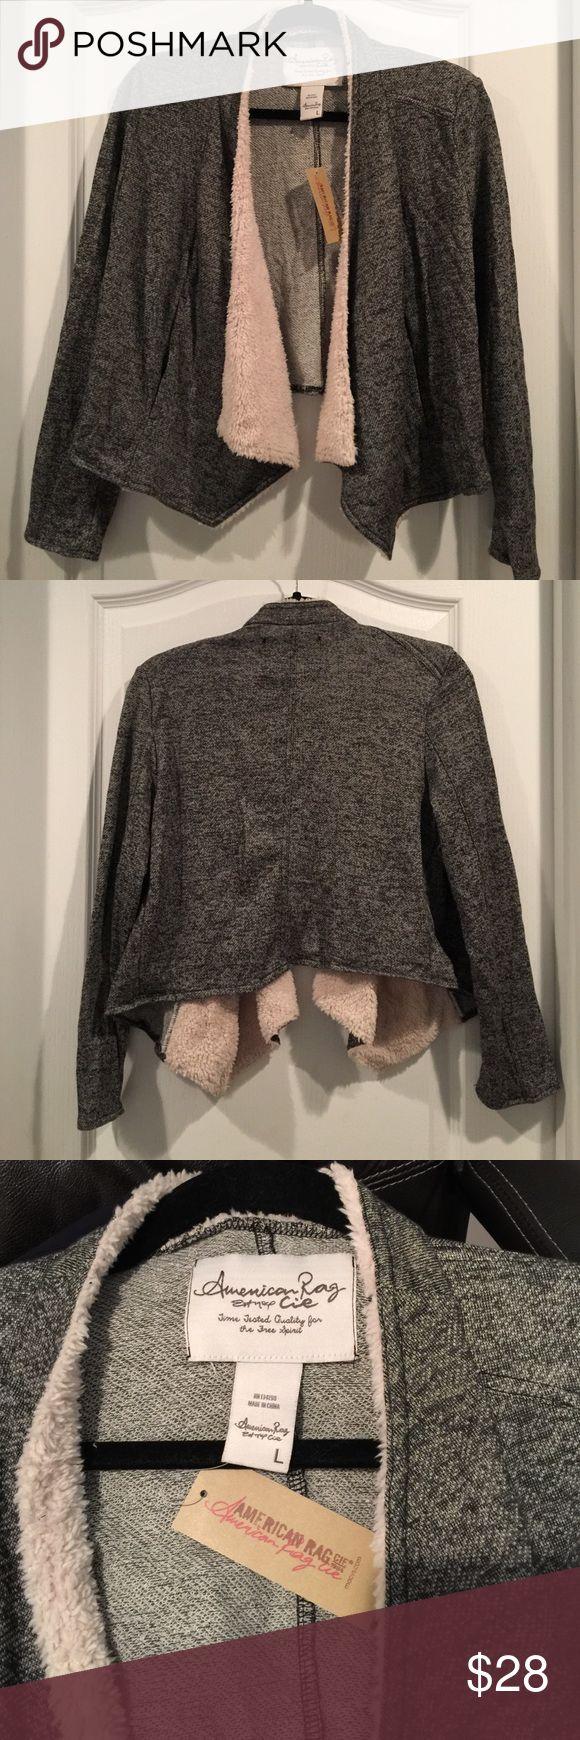 American Rag shrug Soft and cozy American Rag shrug will keep you warm this winter ❄️ American Rag Jackets & Coats